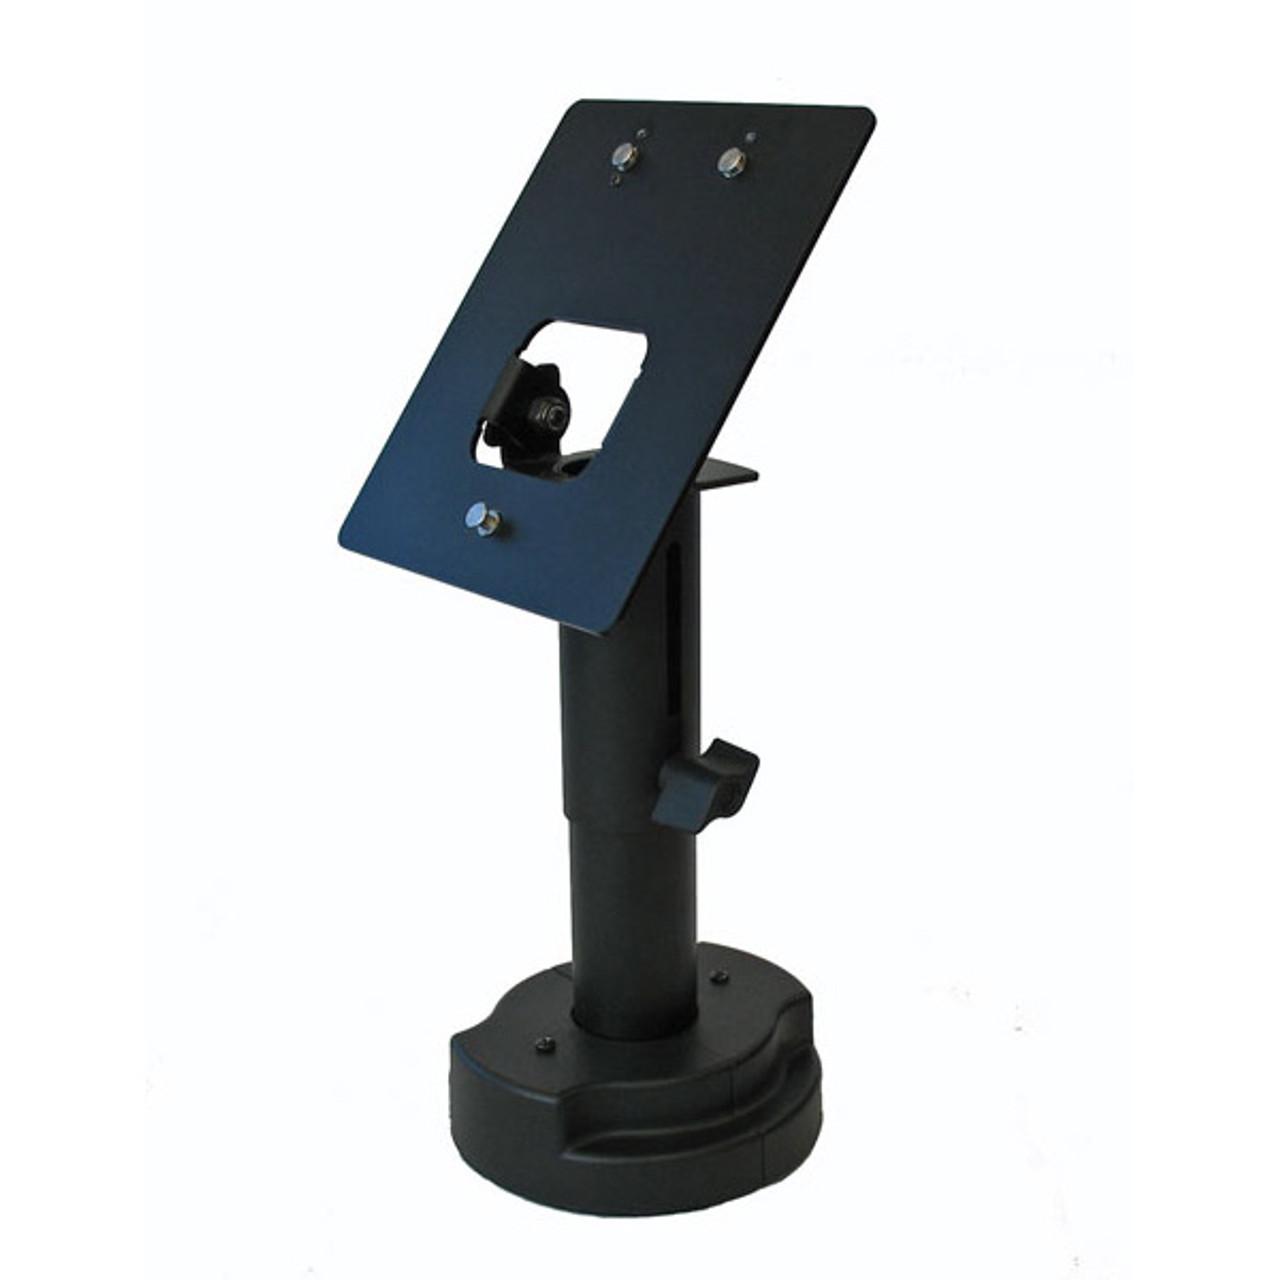 Swivel Stands Credit Card Stand Telescoping Pedestal VeriFone MX850